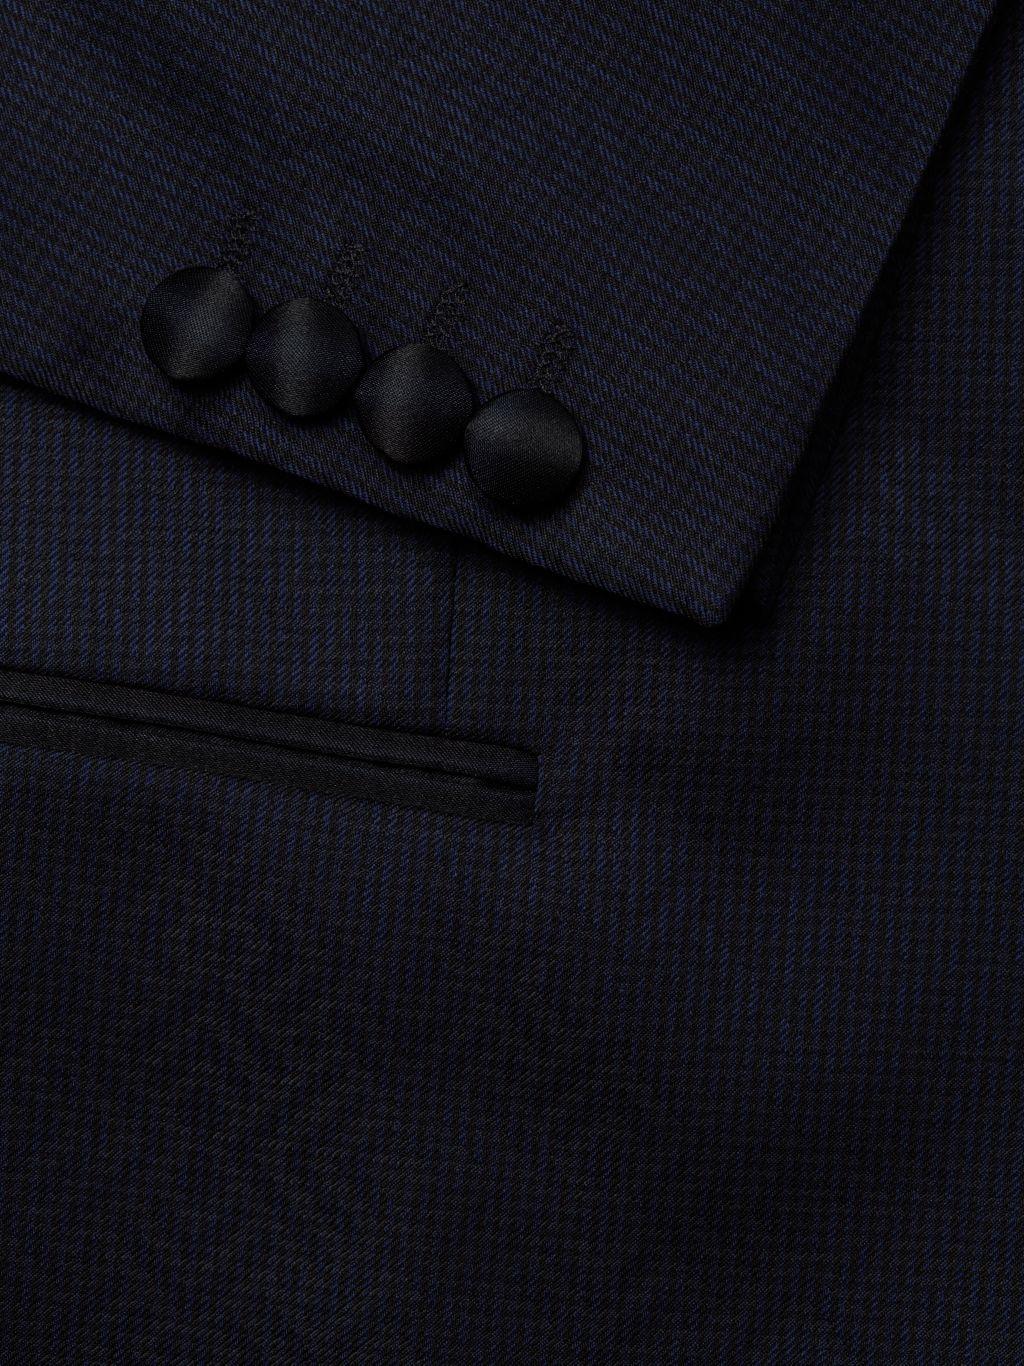 Armani Collezioni G-Line Geometric-Print Virgin Wool Dinner Jacket